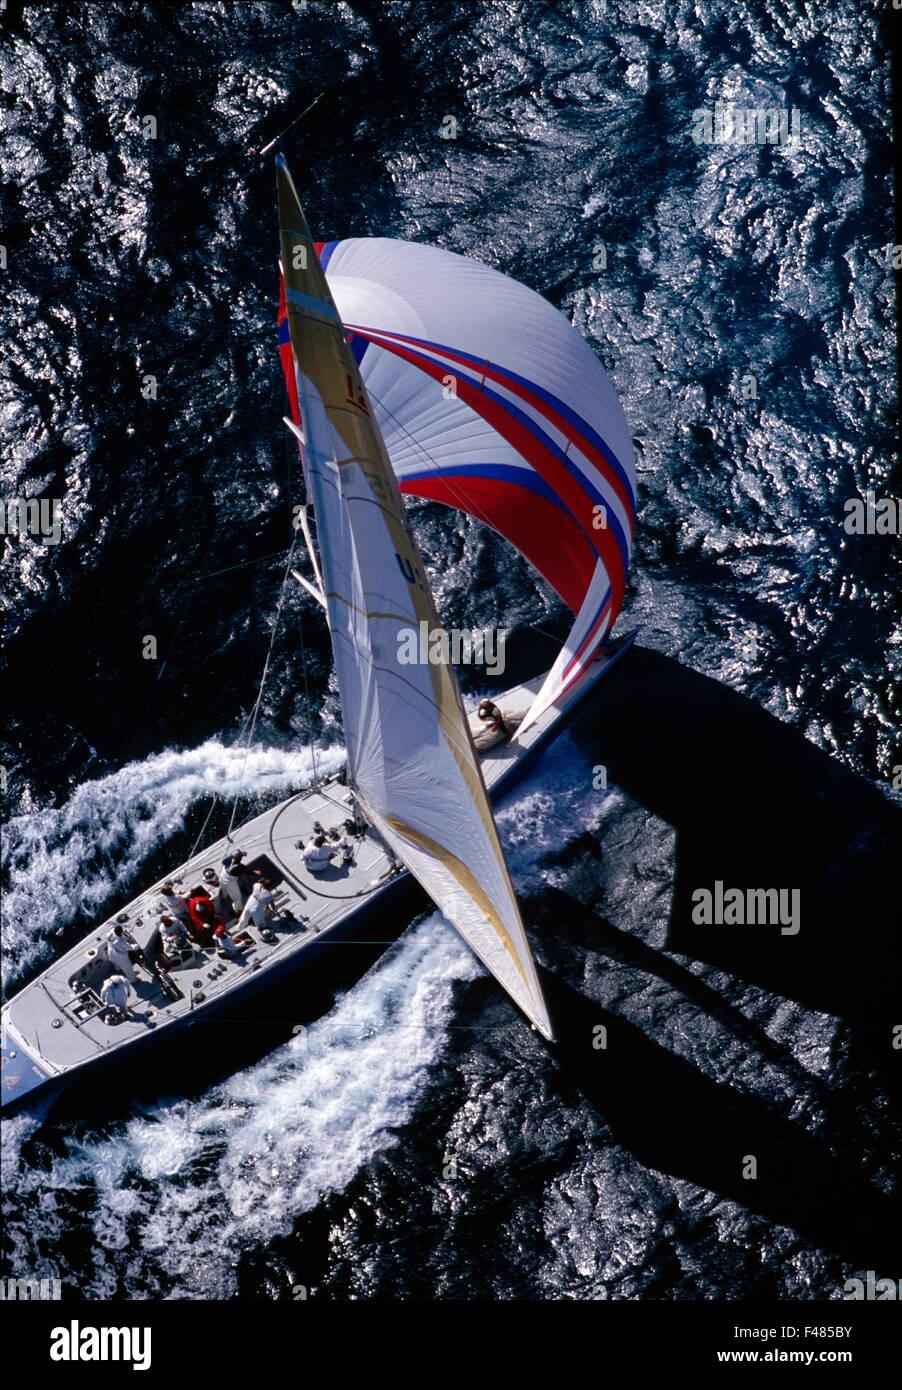 AJAXNETPHOTO - 1987. FREMANTLE, AUSTRALIA. AMERICA'S CUP - STARS & STRIPES (US55) - DENNIS CONNER - USA - Stock Image